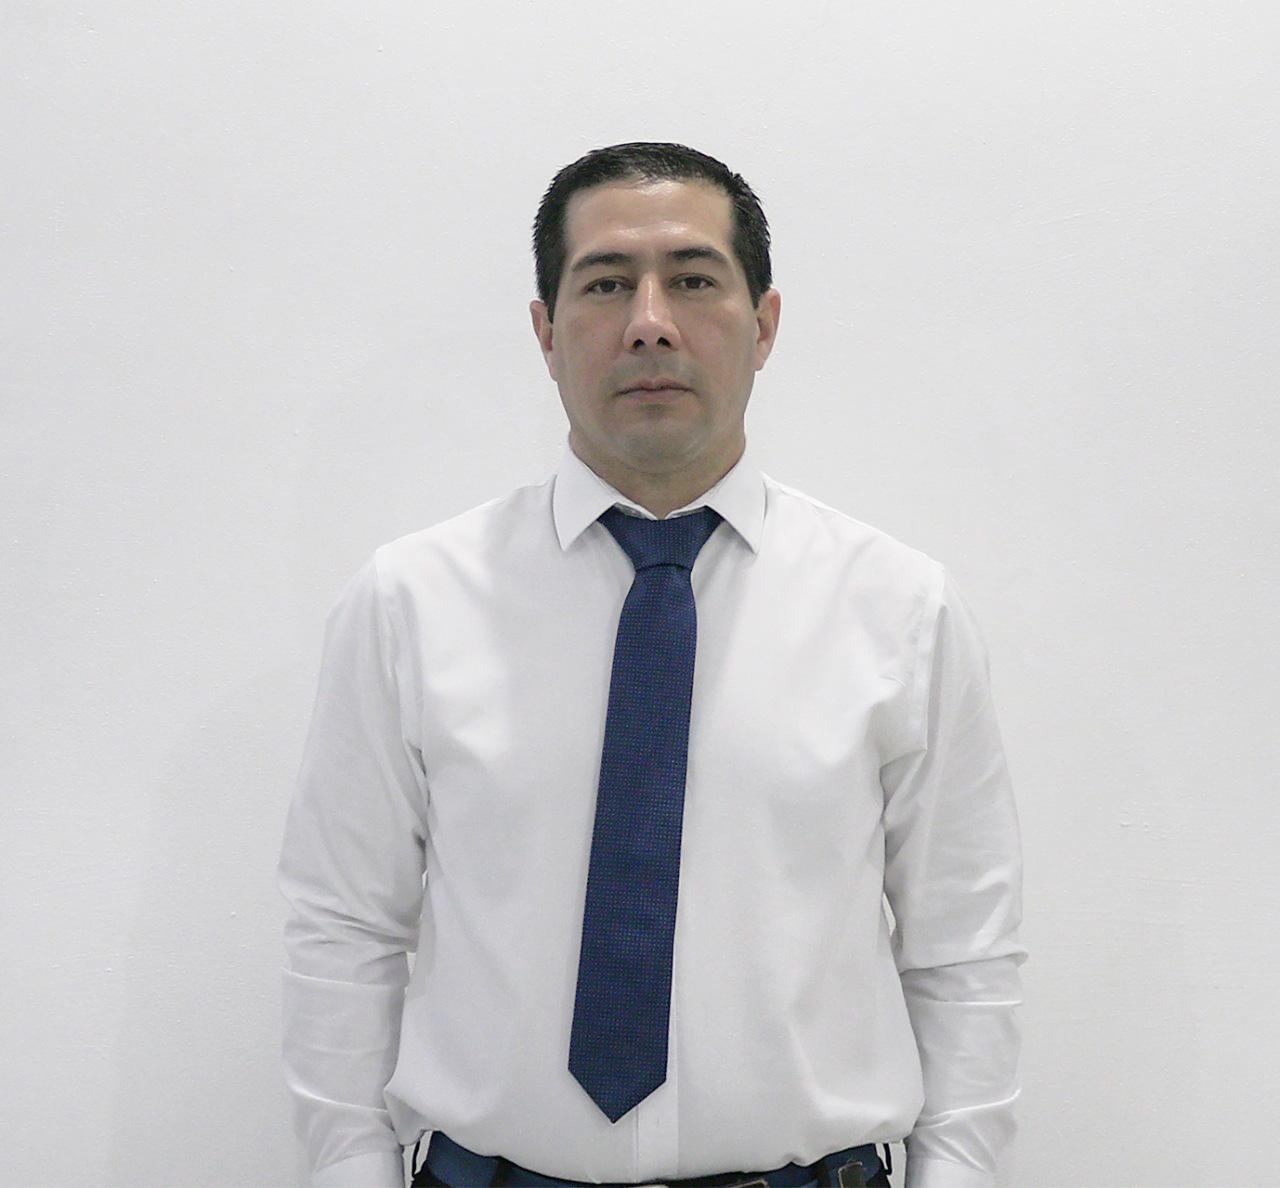 Dr. Rolando Náfate Hernández